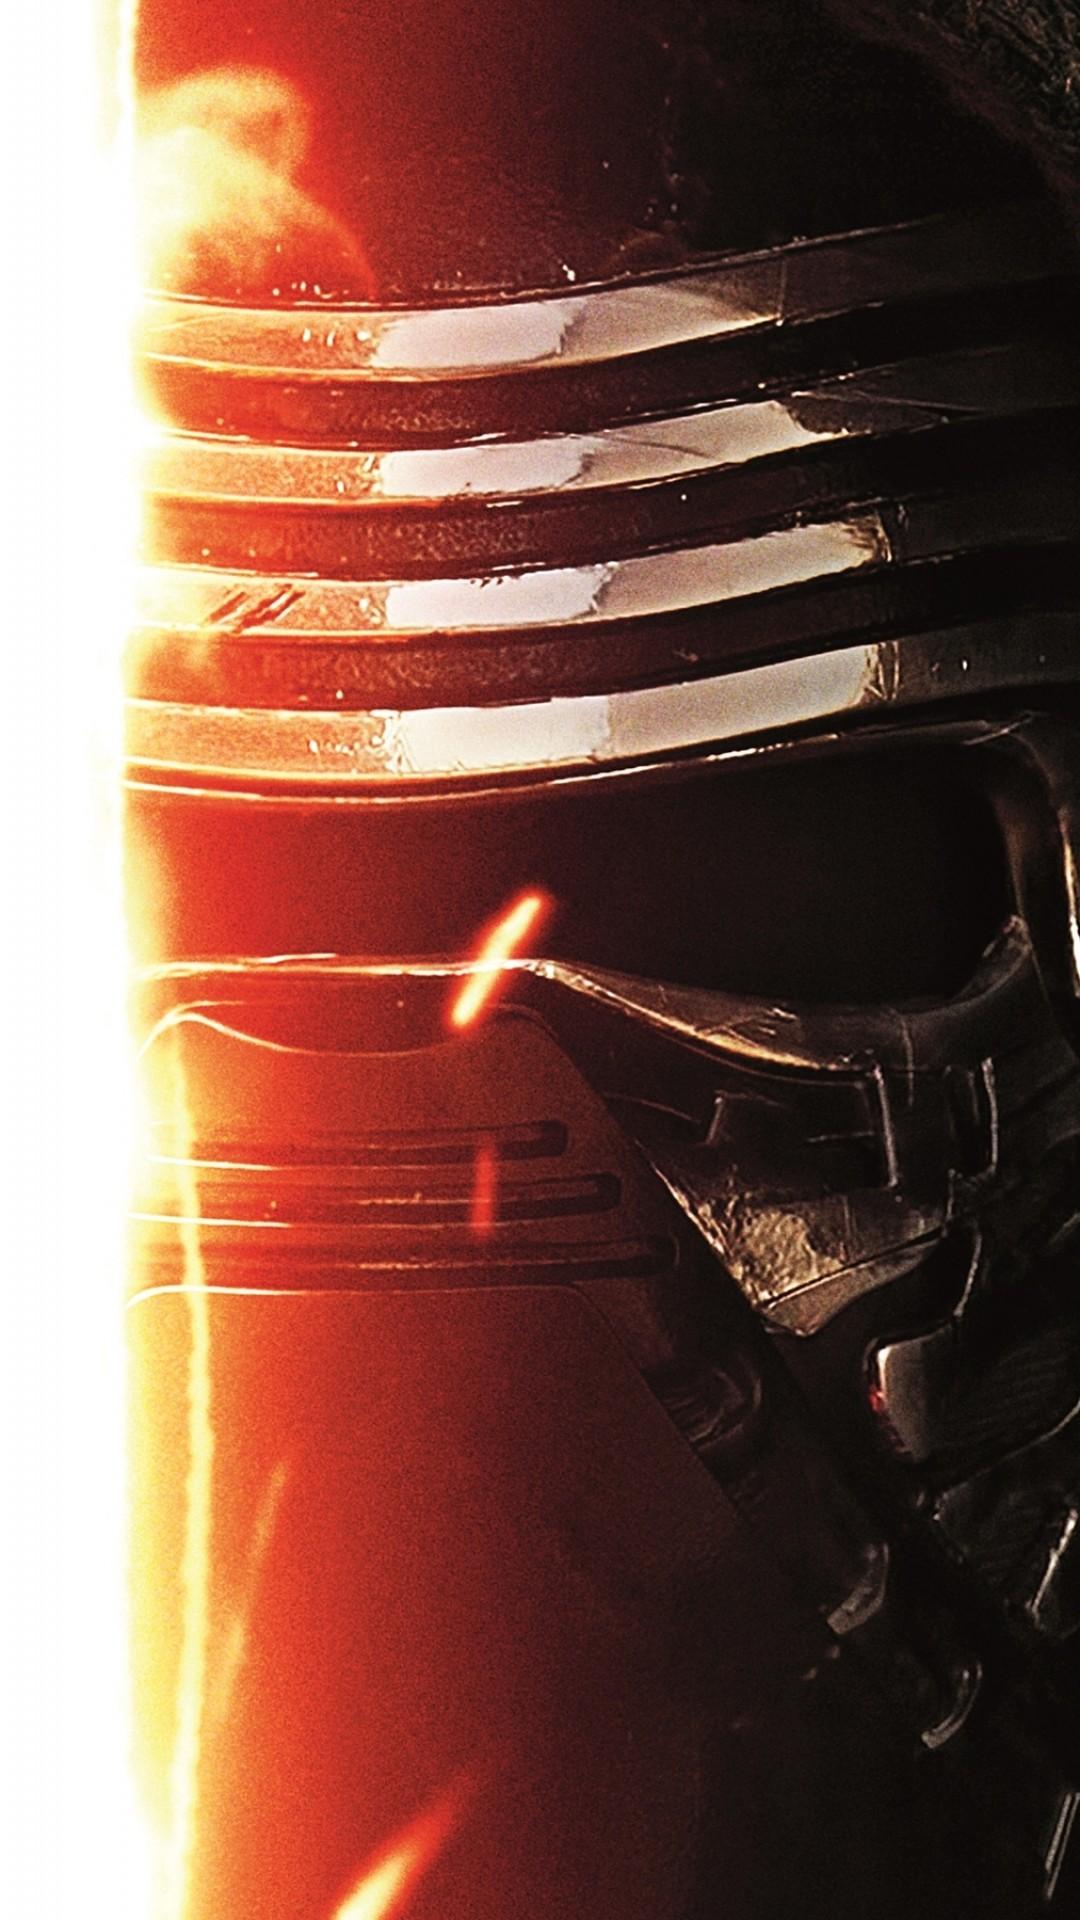 Star Wars The Force Awakens Wallpaper Kylo Ren Lightsaber